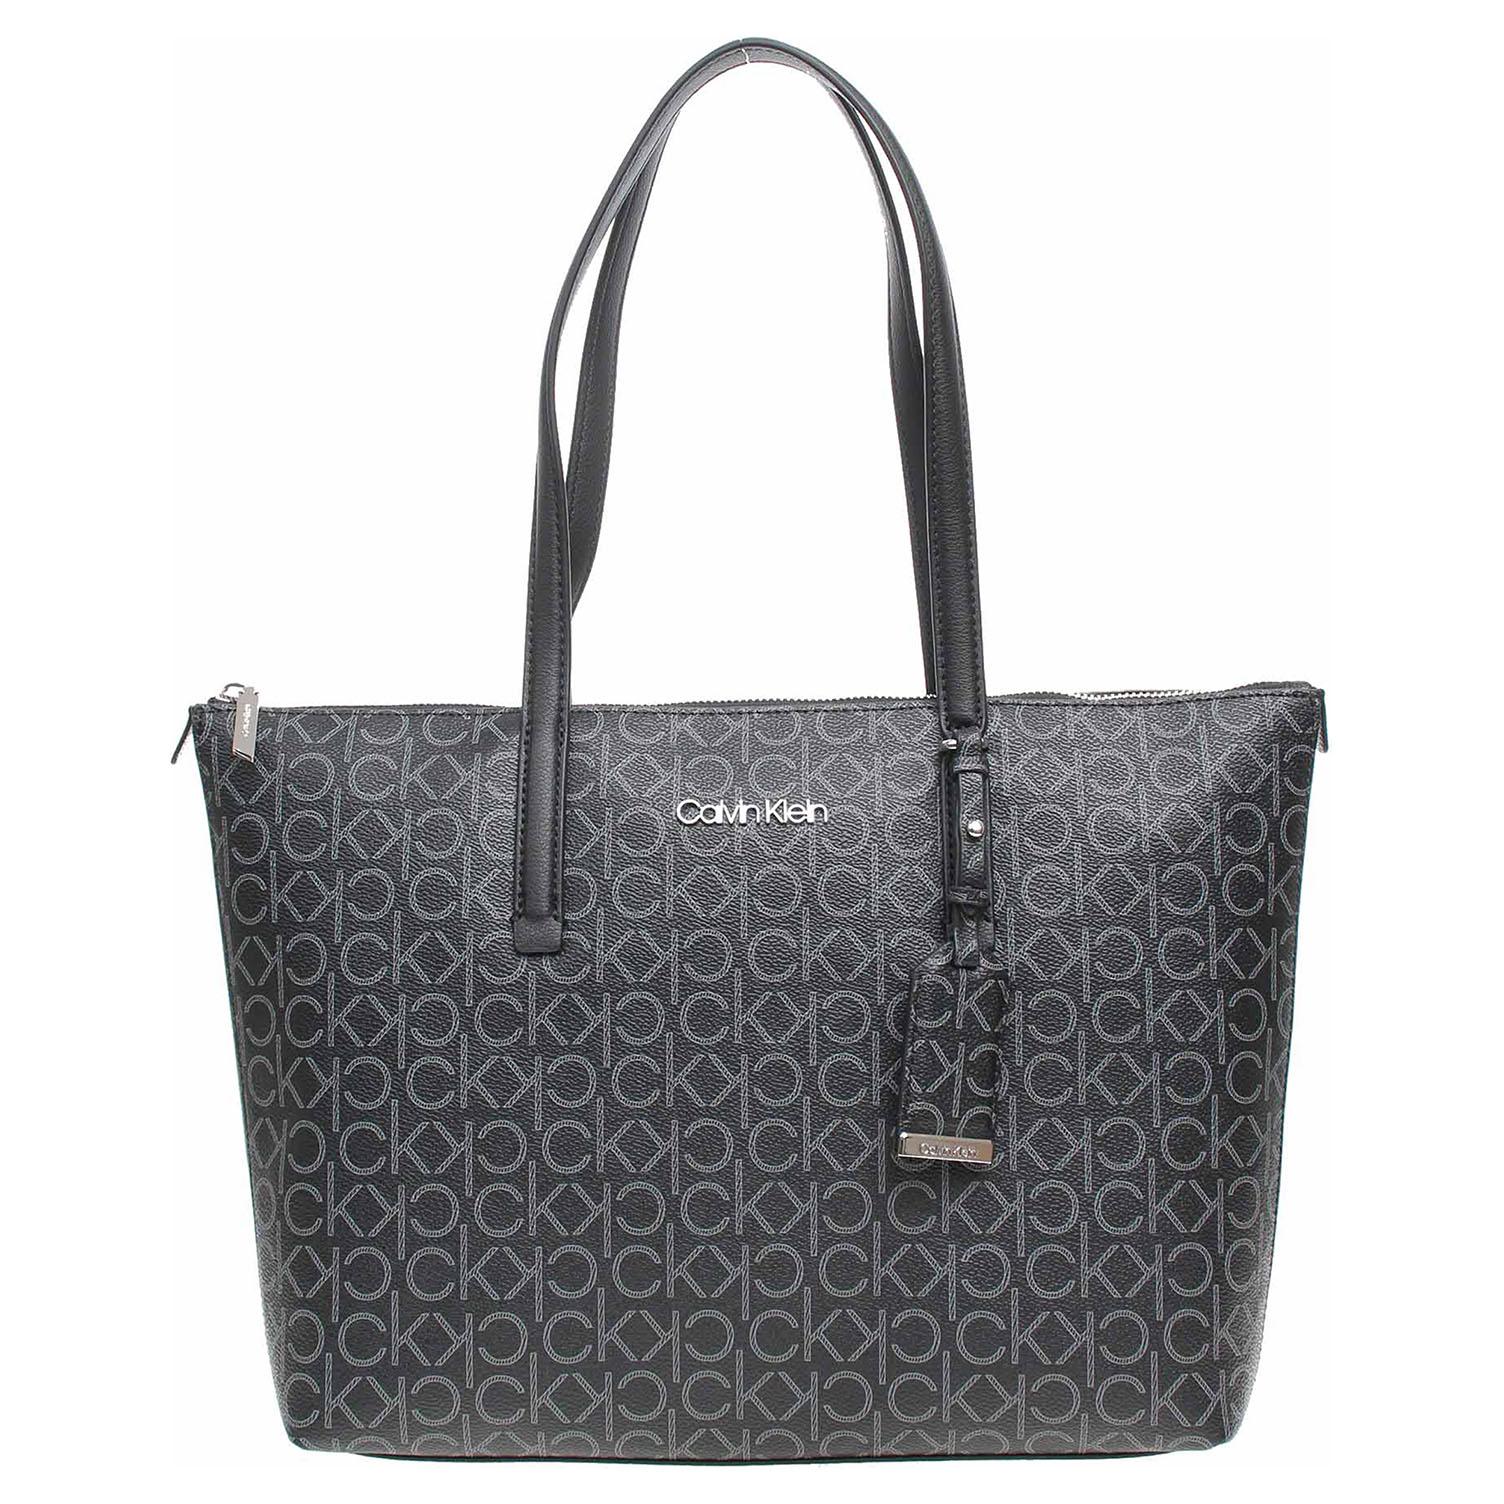 Ecco Calvin Klein dámská kabelka K60K608623 0GJ black 11891813